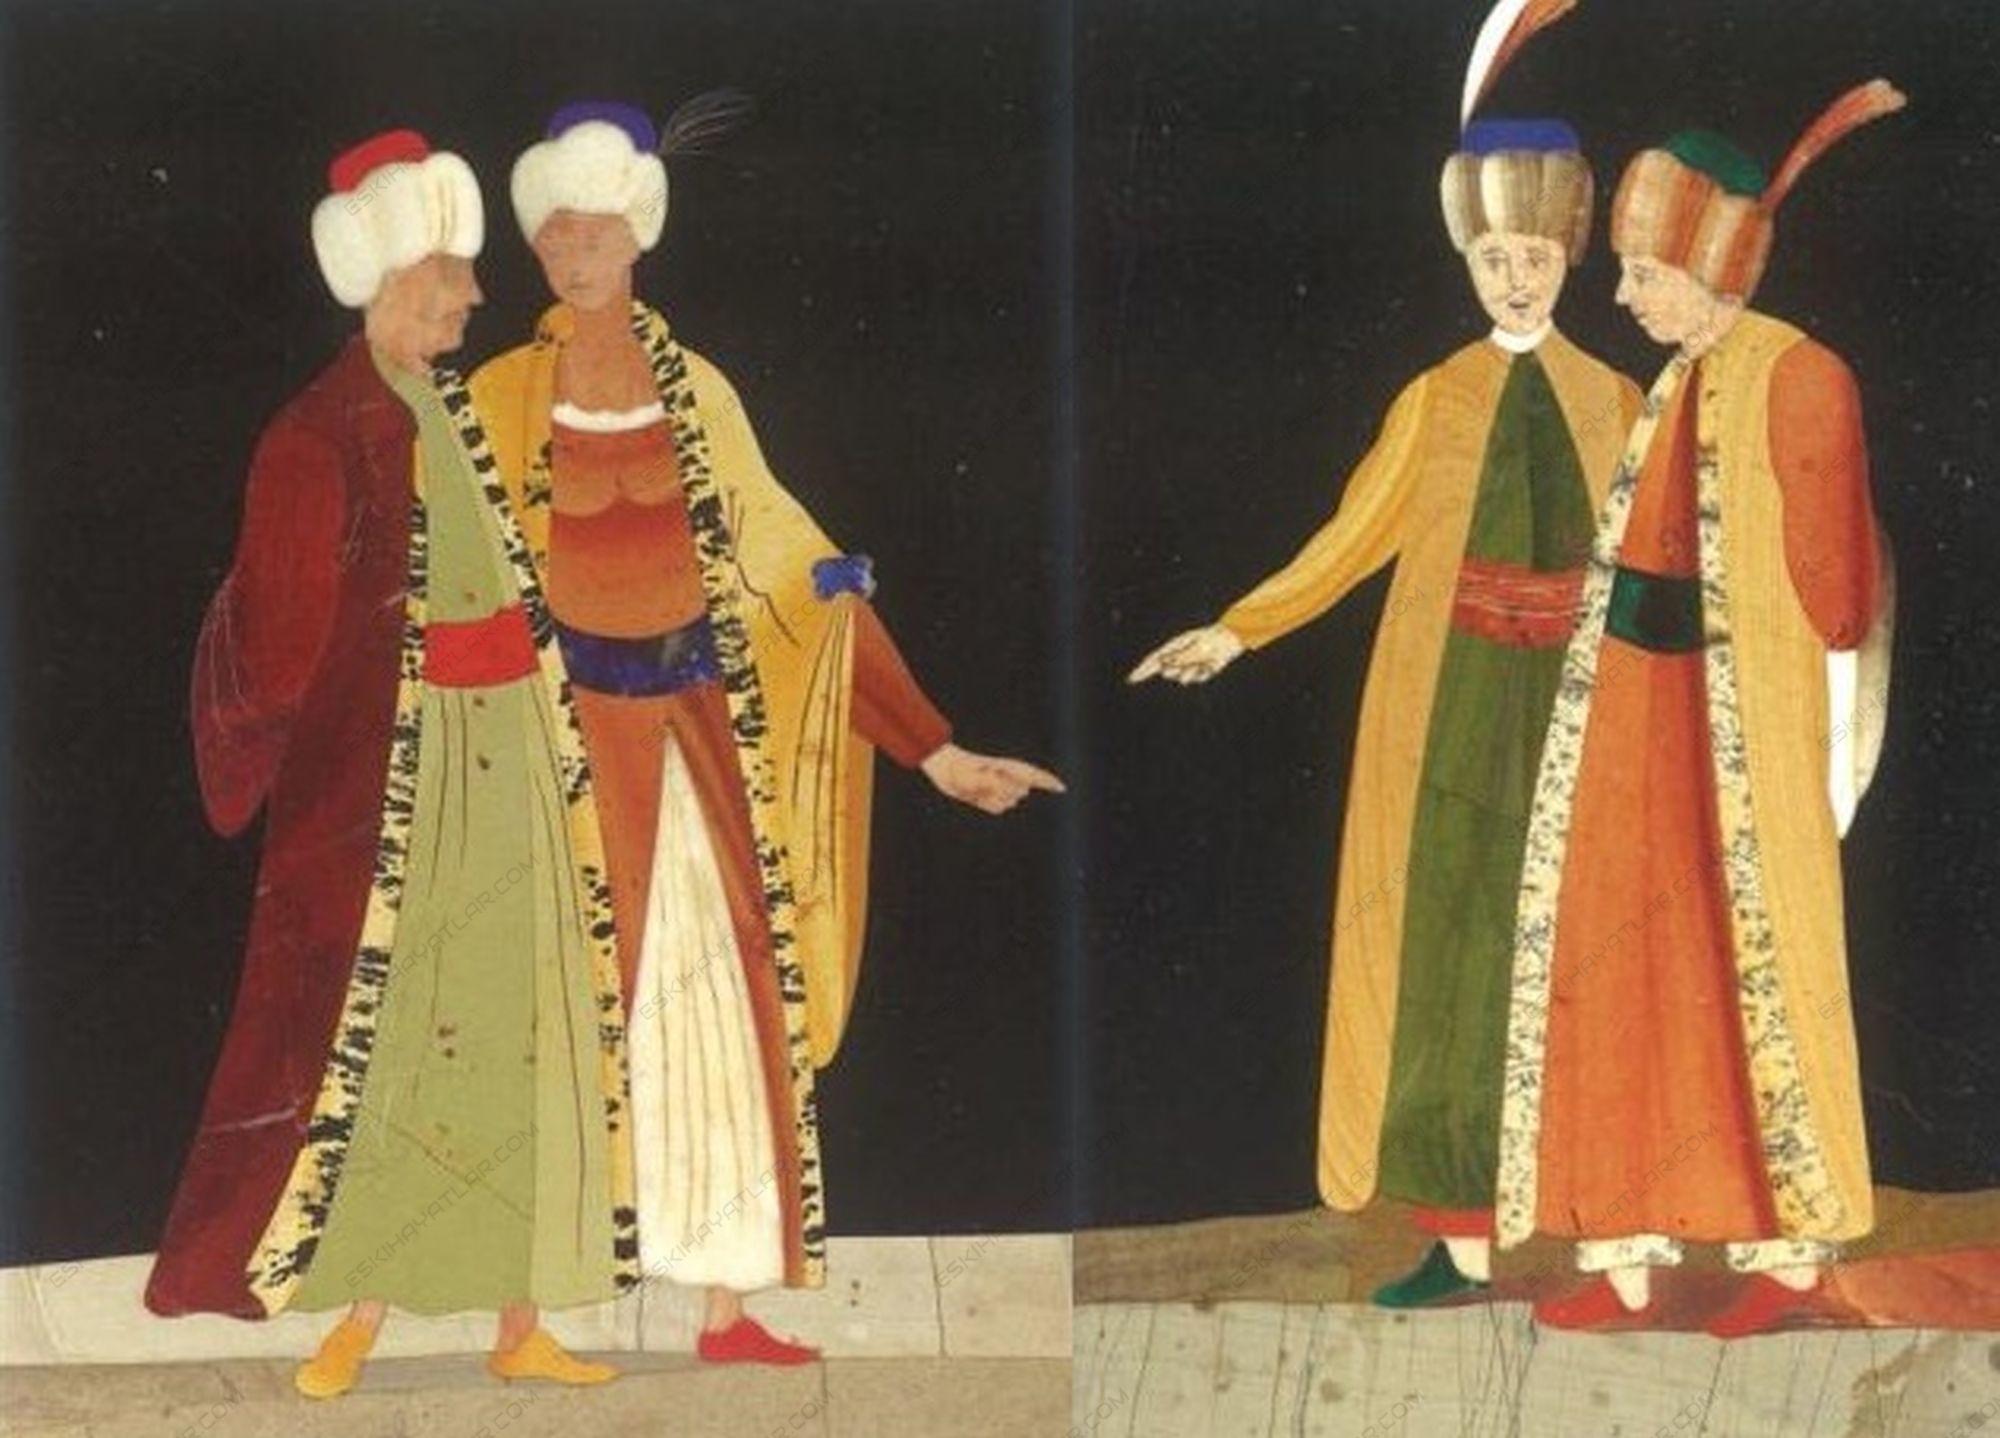 0376-17-yuzyilda-avrupada-turk-modasi-terrible-turk-osmanli-kiyafetleri (3)